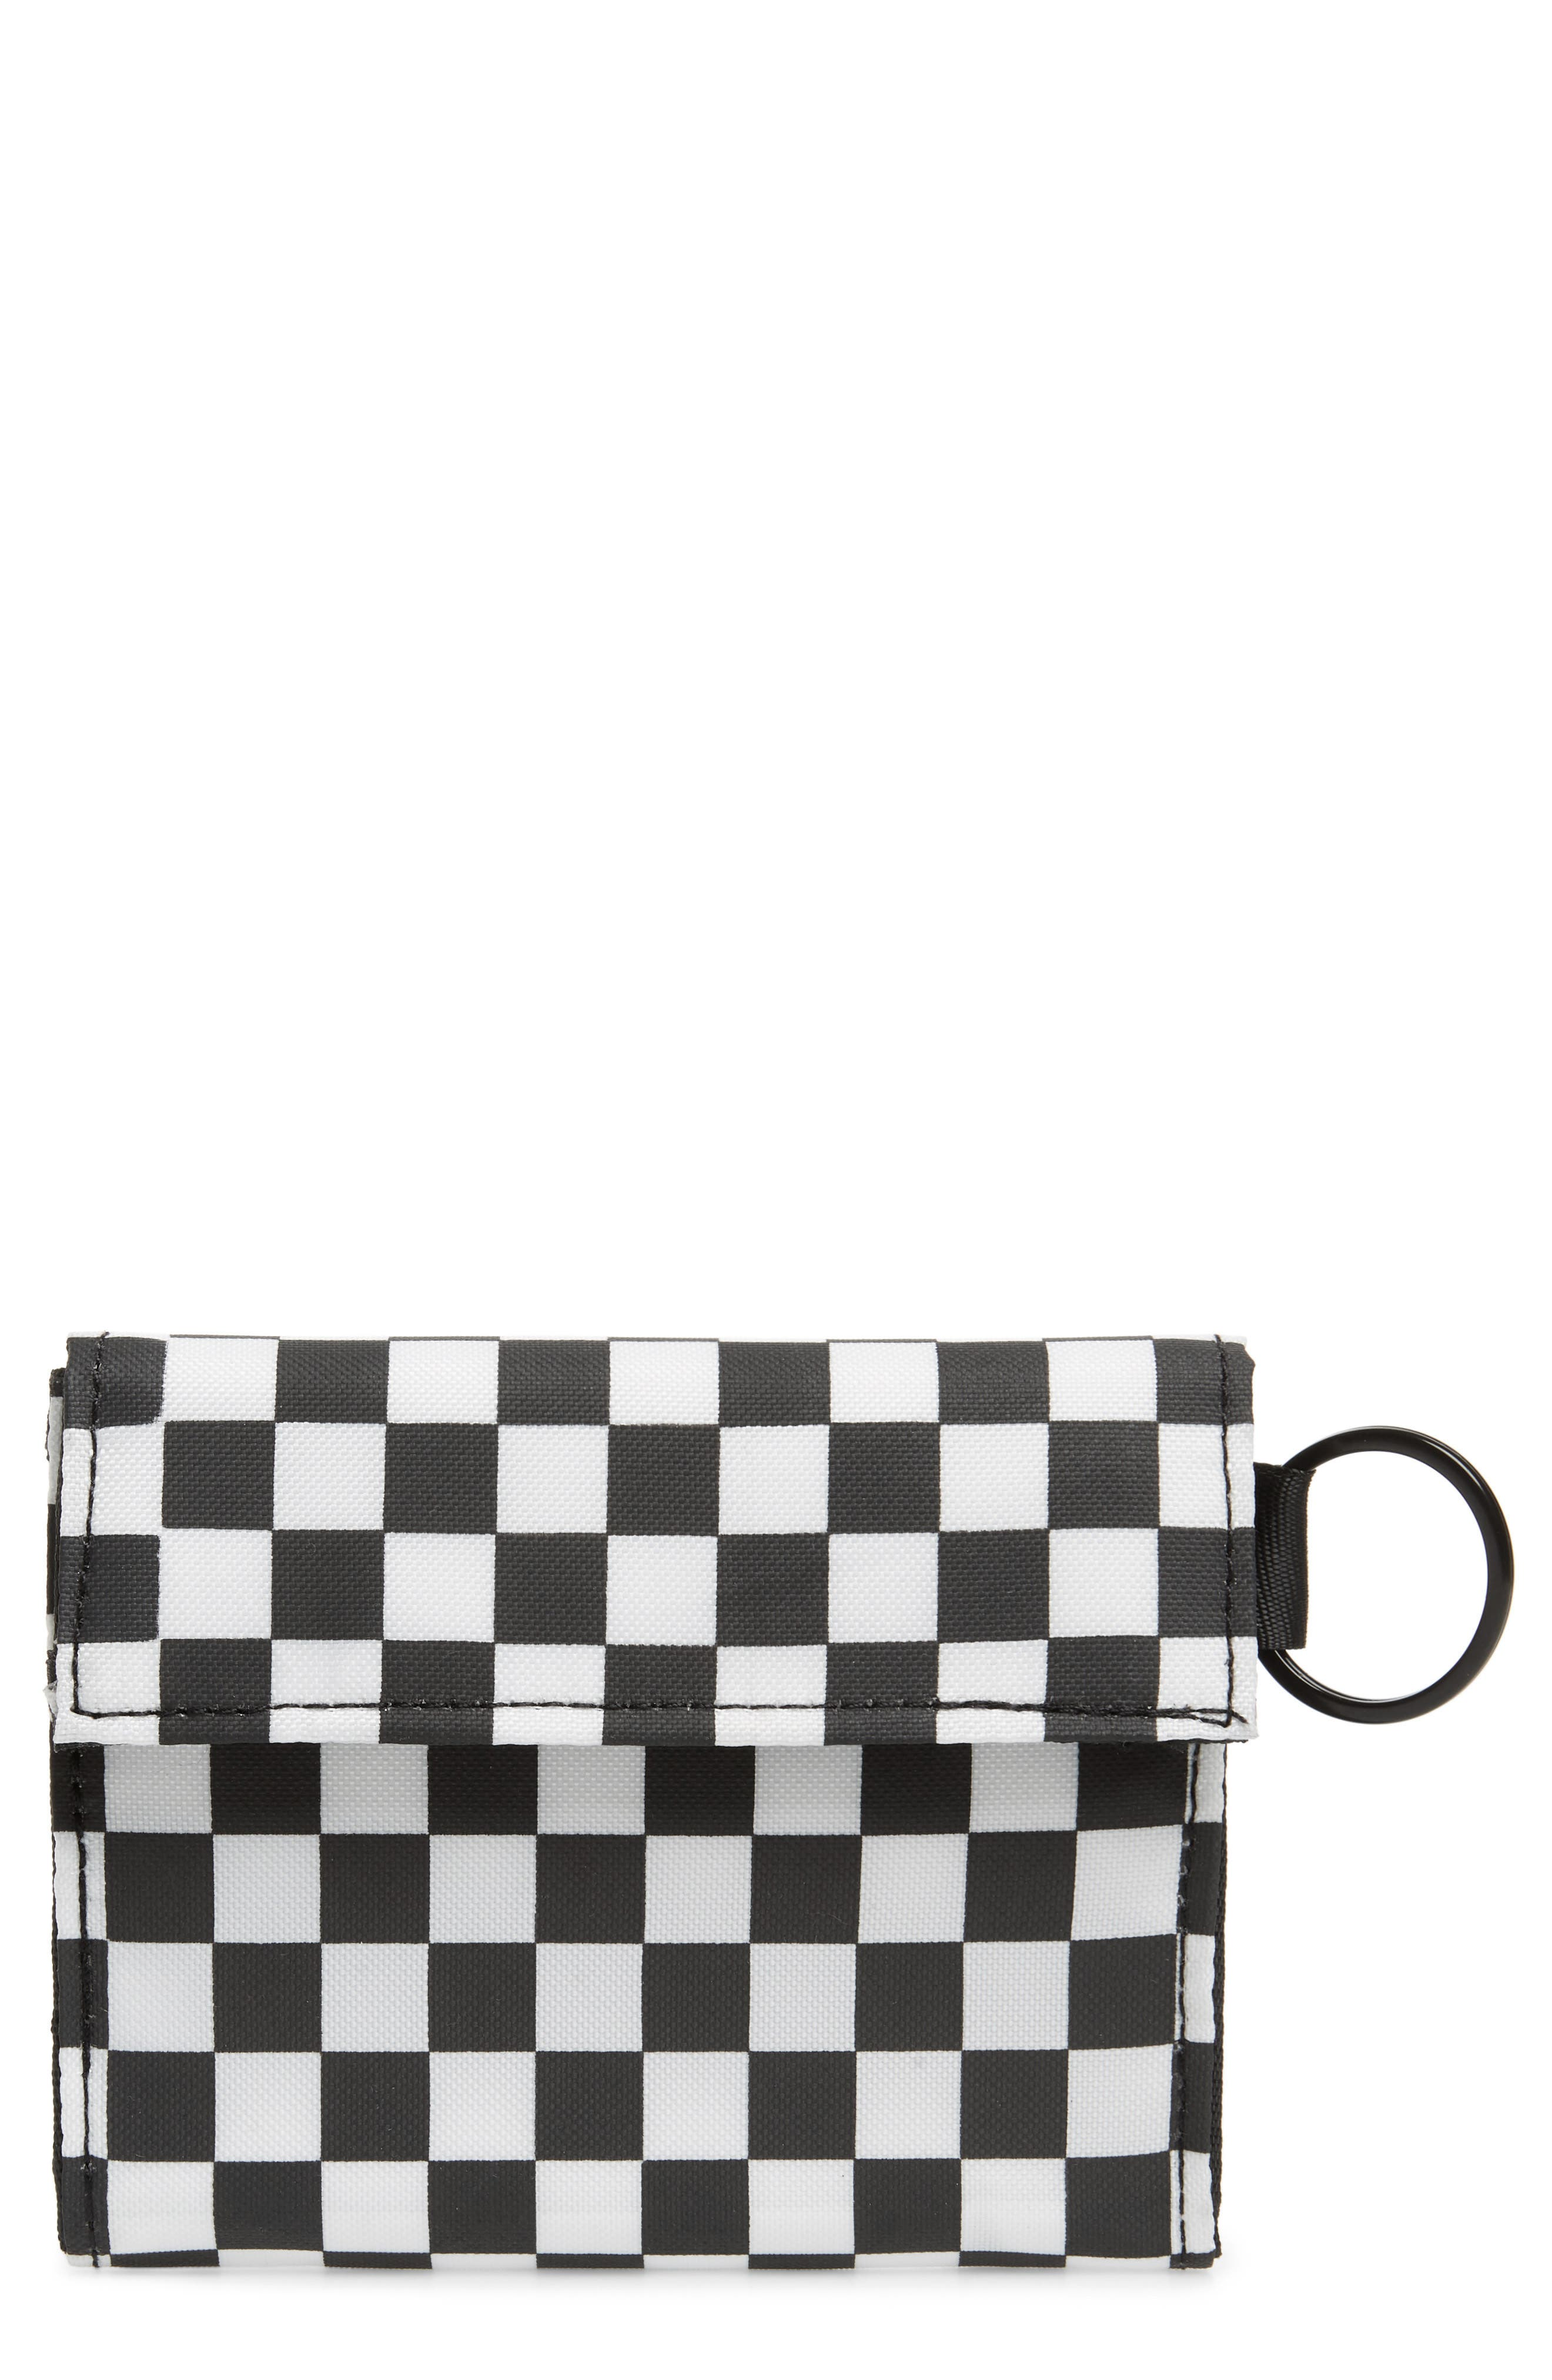 THE RAIL Xander Wallet, Main, color, BLACK/ WHITE CHECKERBOARD